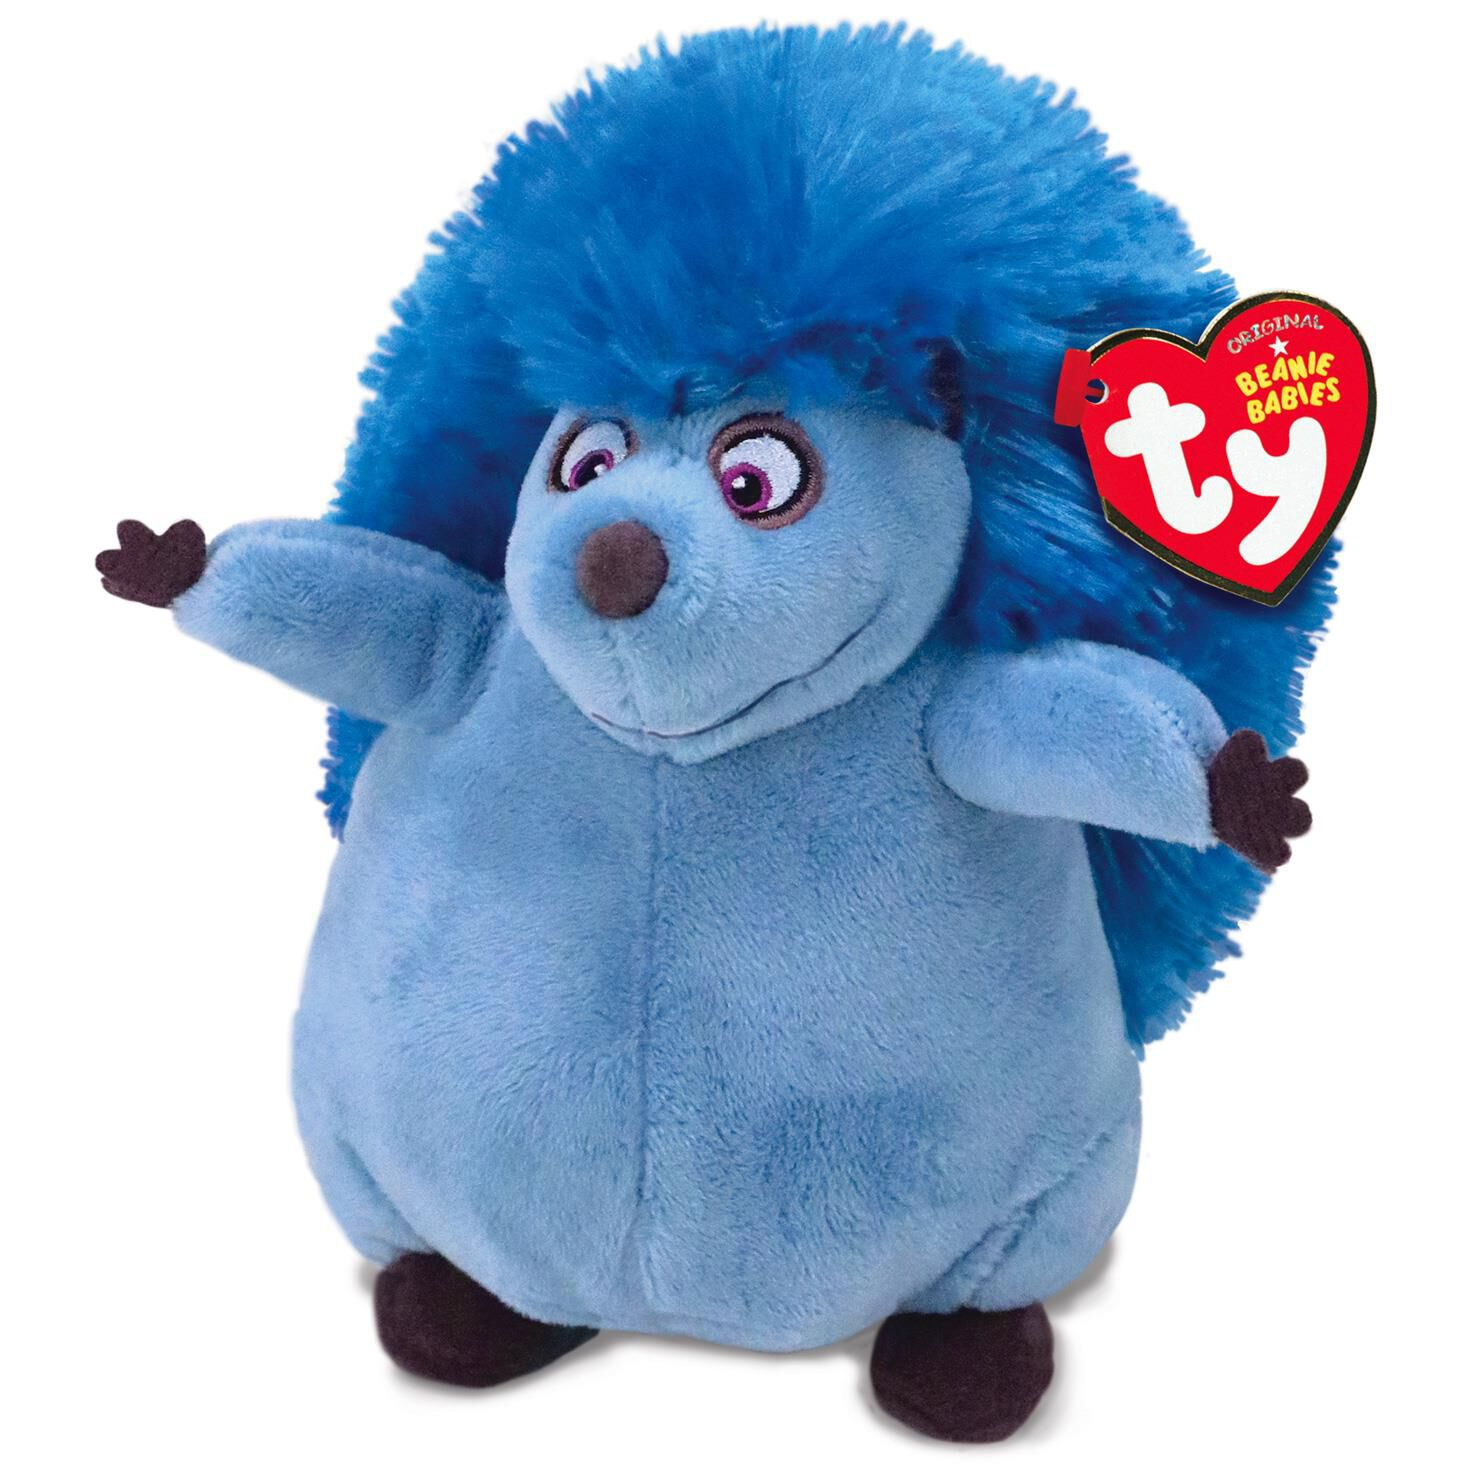 Ty® Beanie Babies Cuatro the Hedgehog Stuffed Animal 7ce74ed48b3